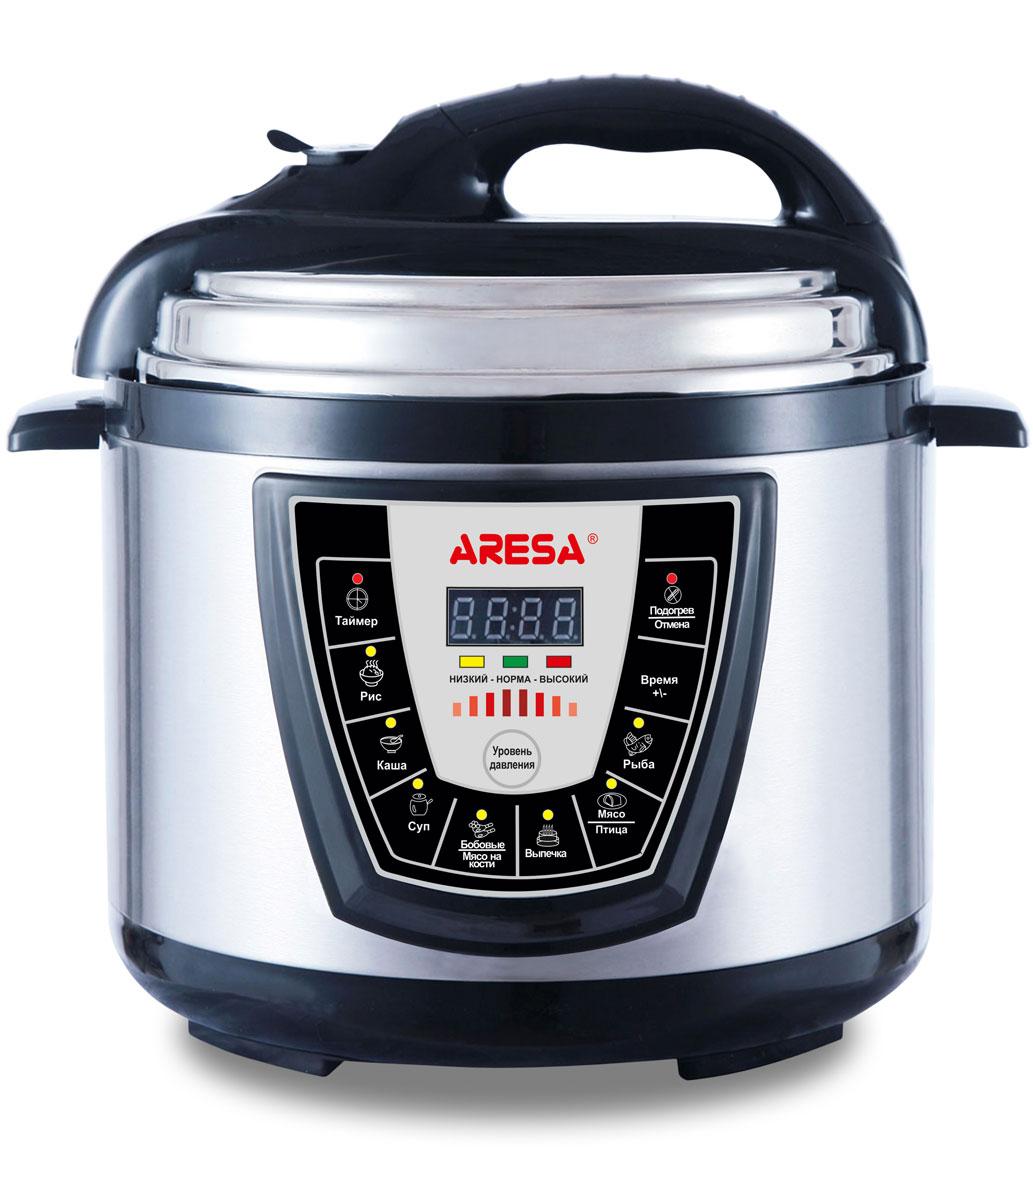 Купить Aresa AR-2003 мультиварка-скороварка